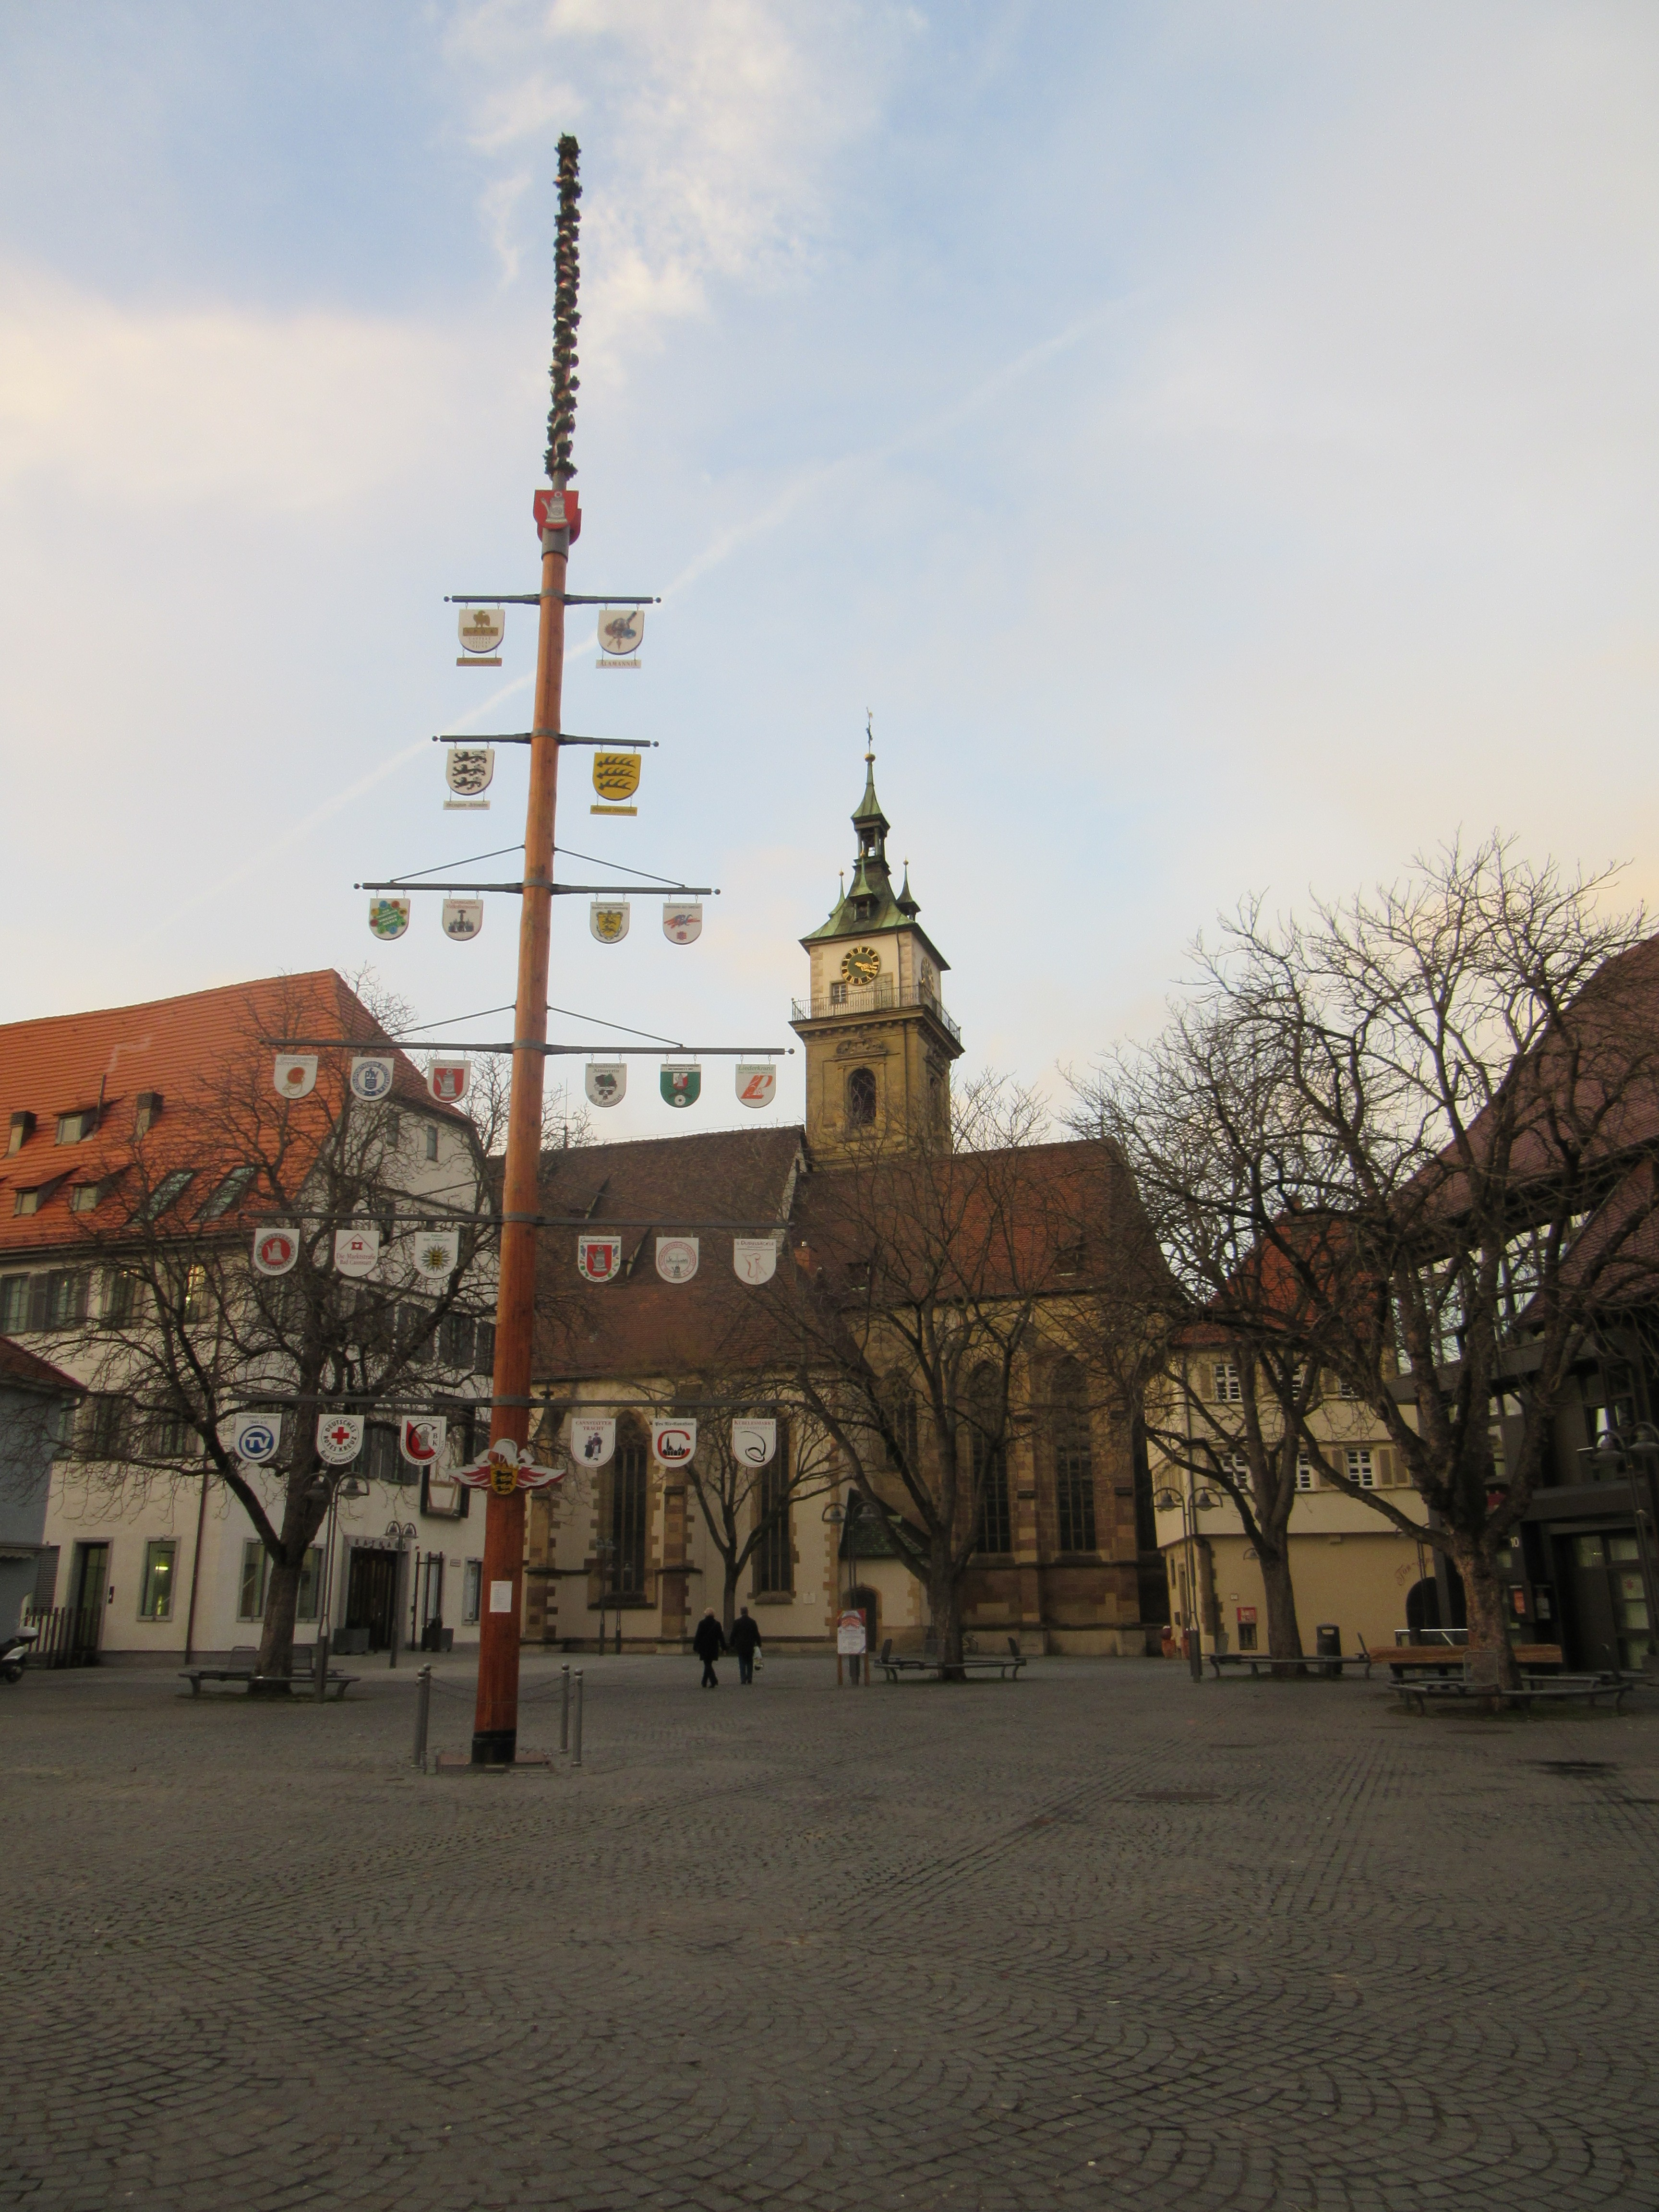 Marktplatz in Bad-Cannstatt, Stuttgart.